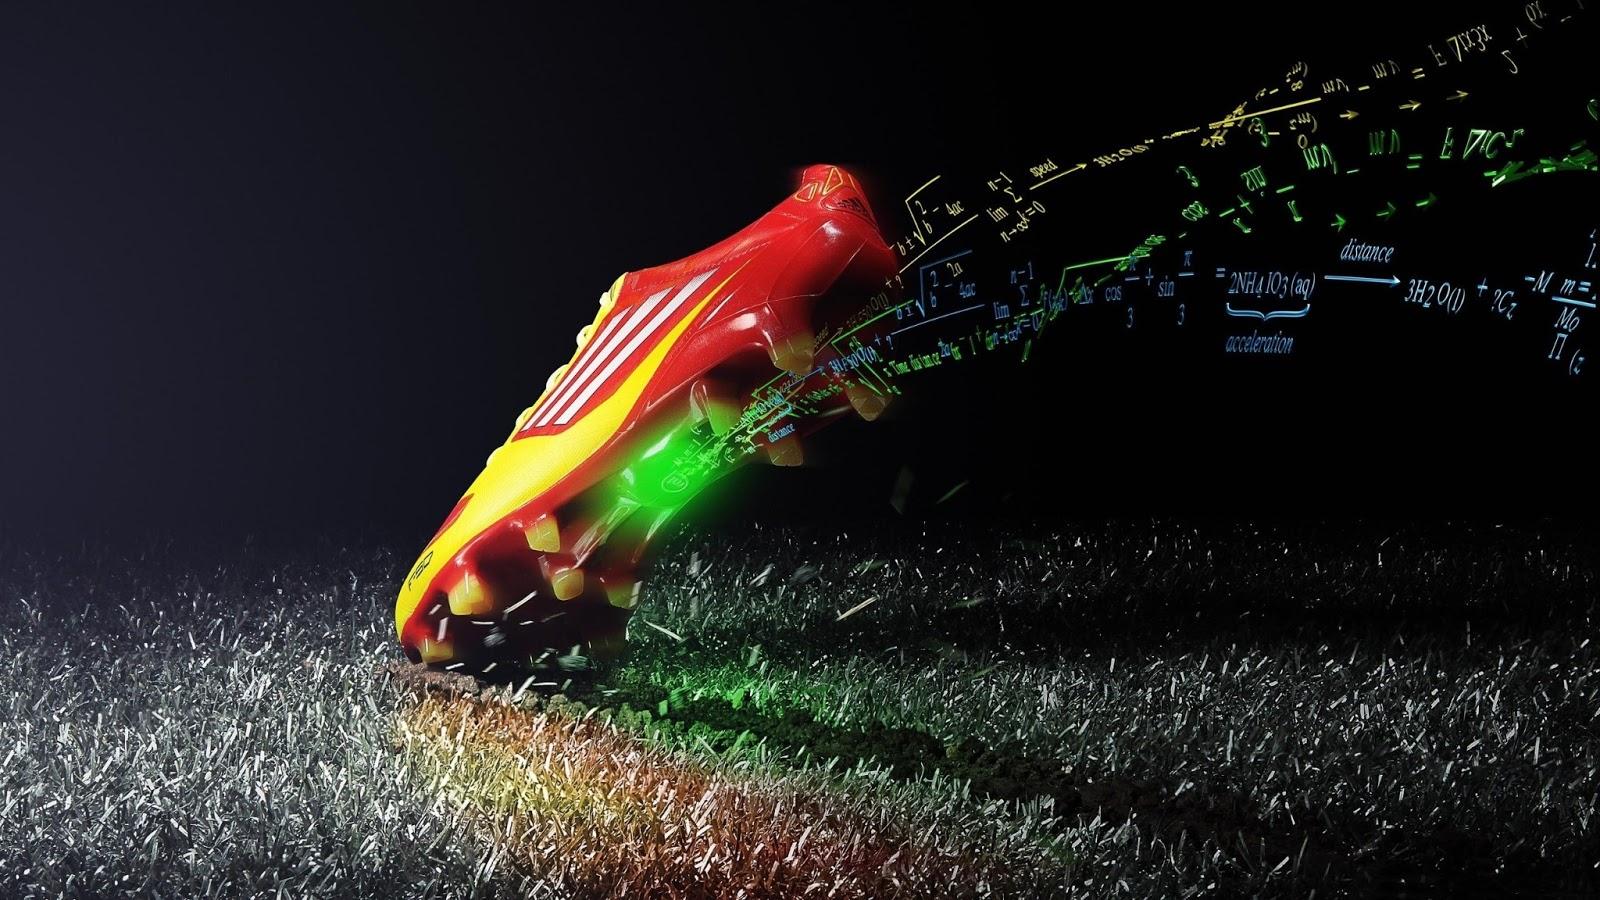 20 best HD Football Soccer Wallpapers Tech Lovers l Web 1600x900